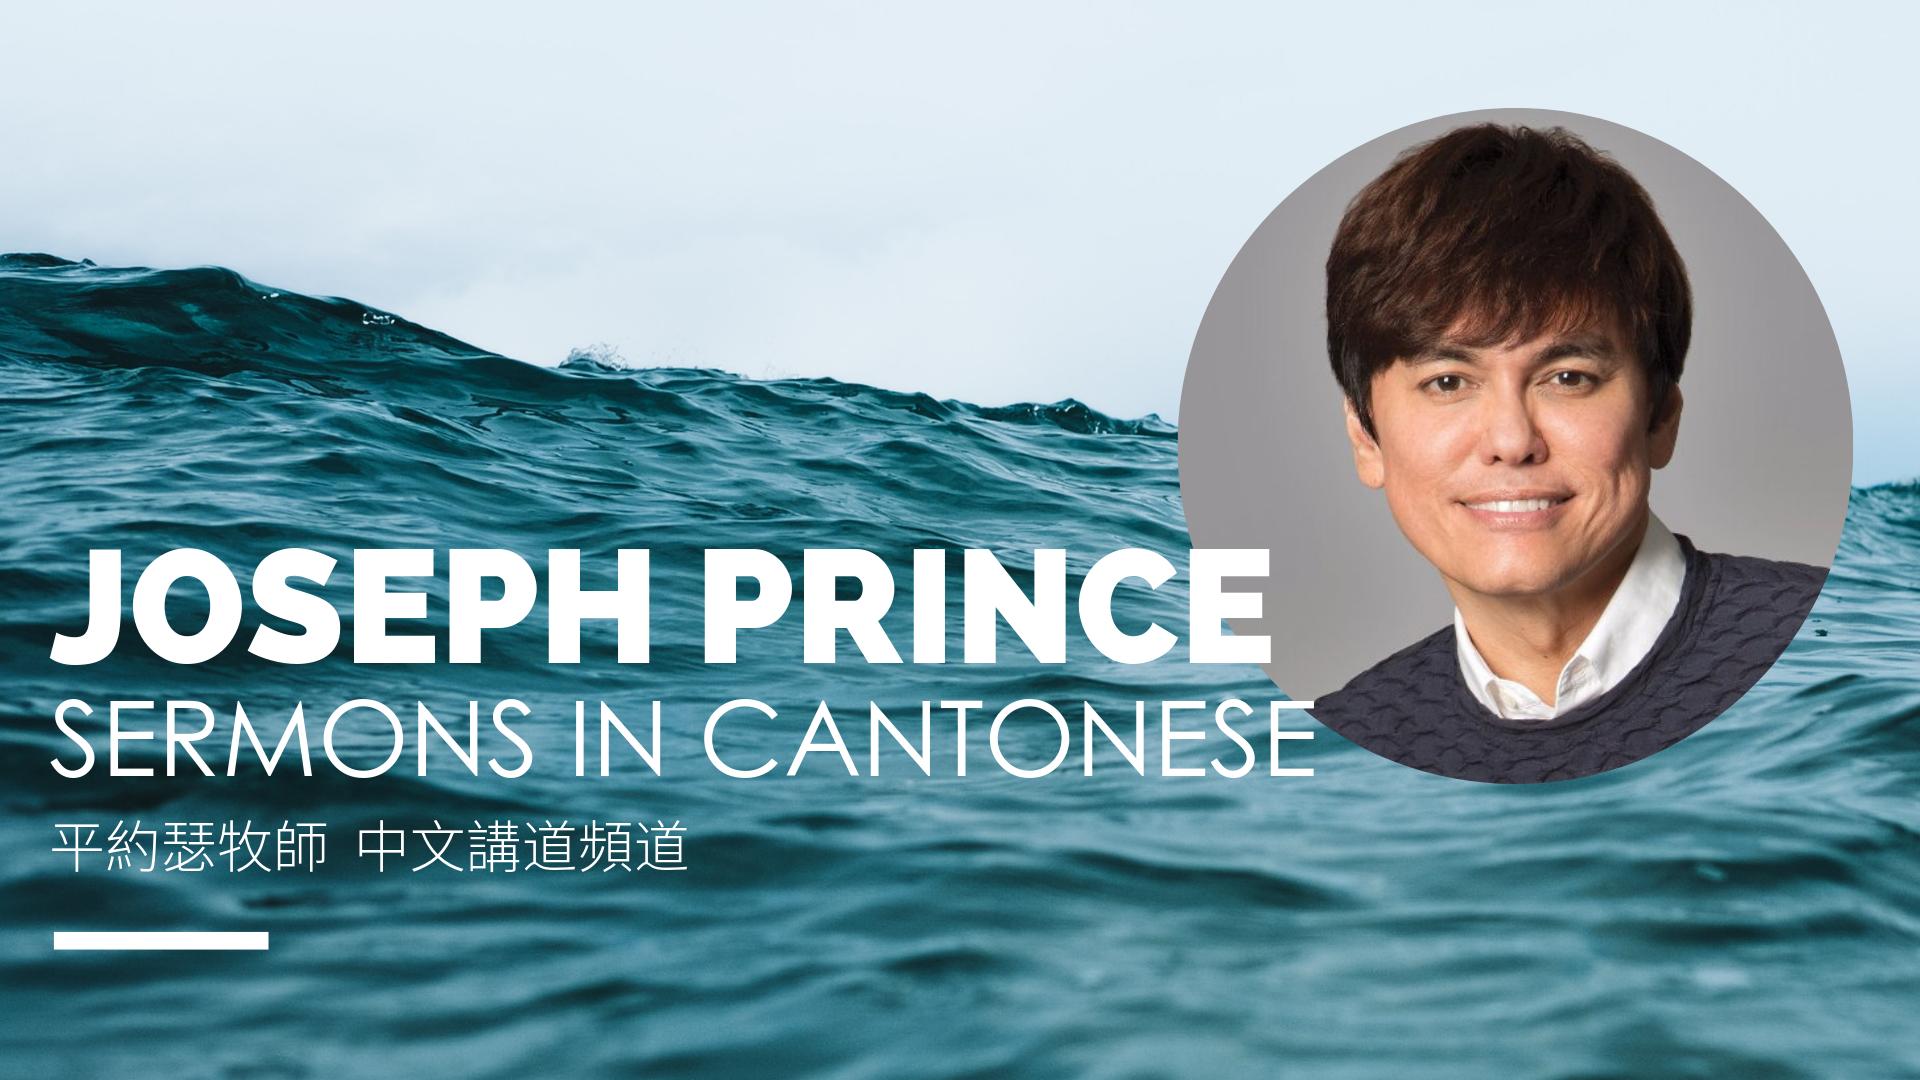 Joseph prince sermons in cantonese (1).png